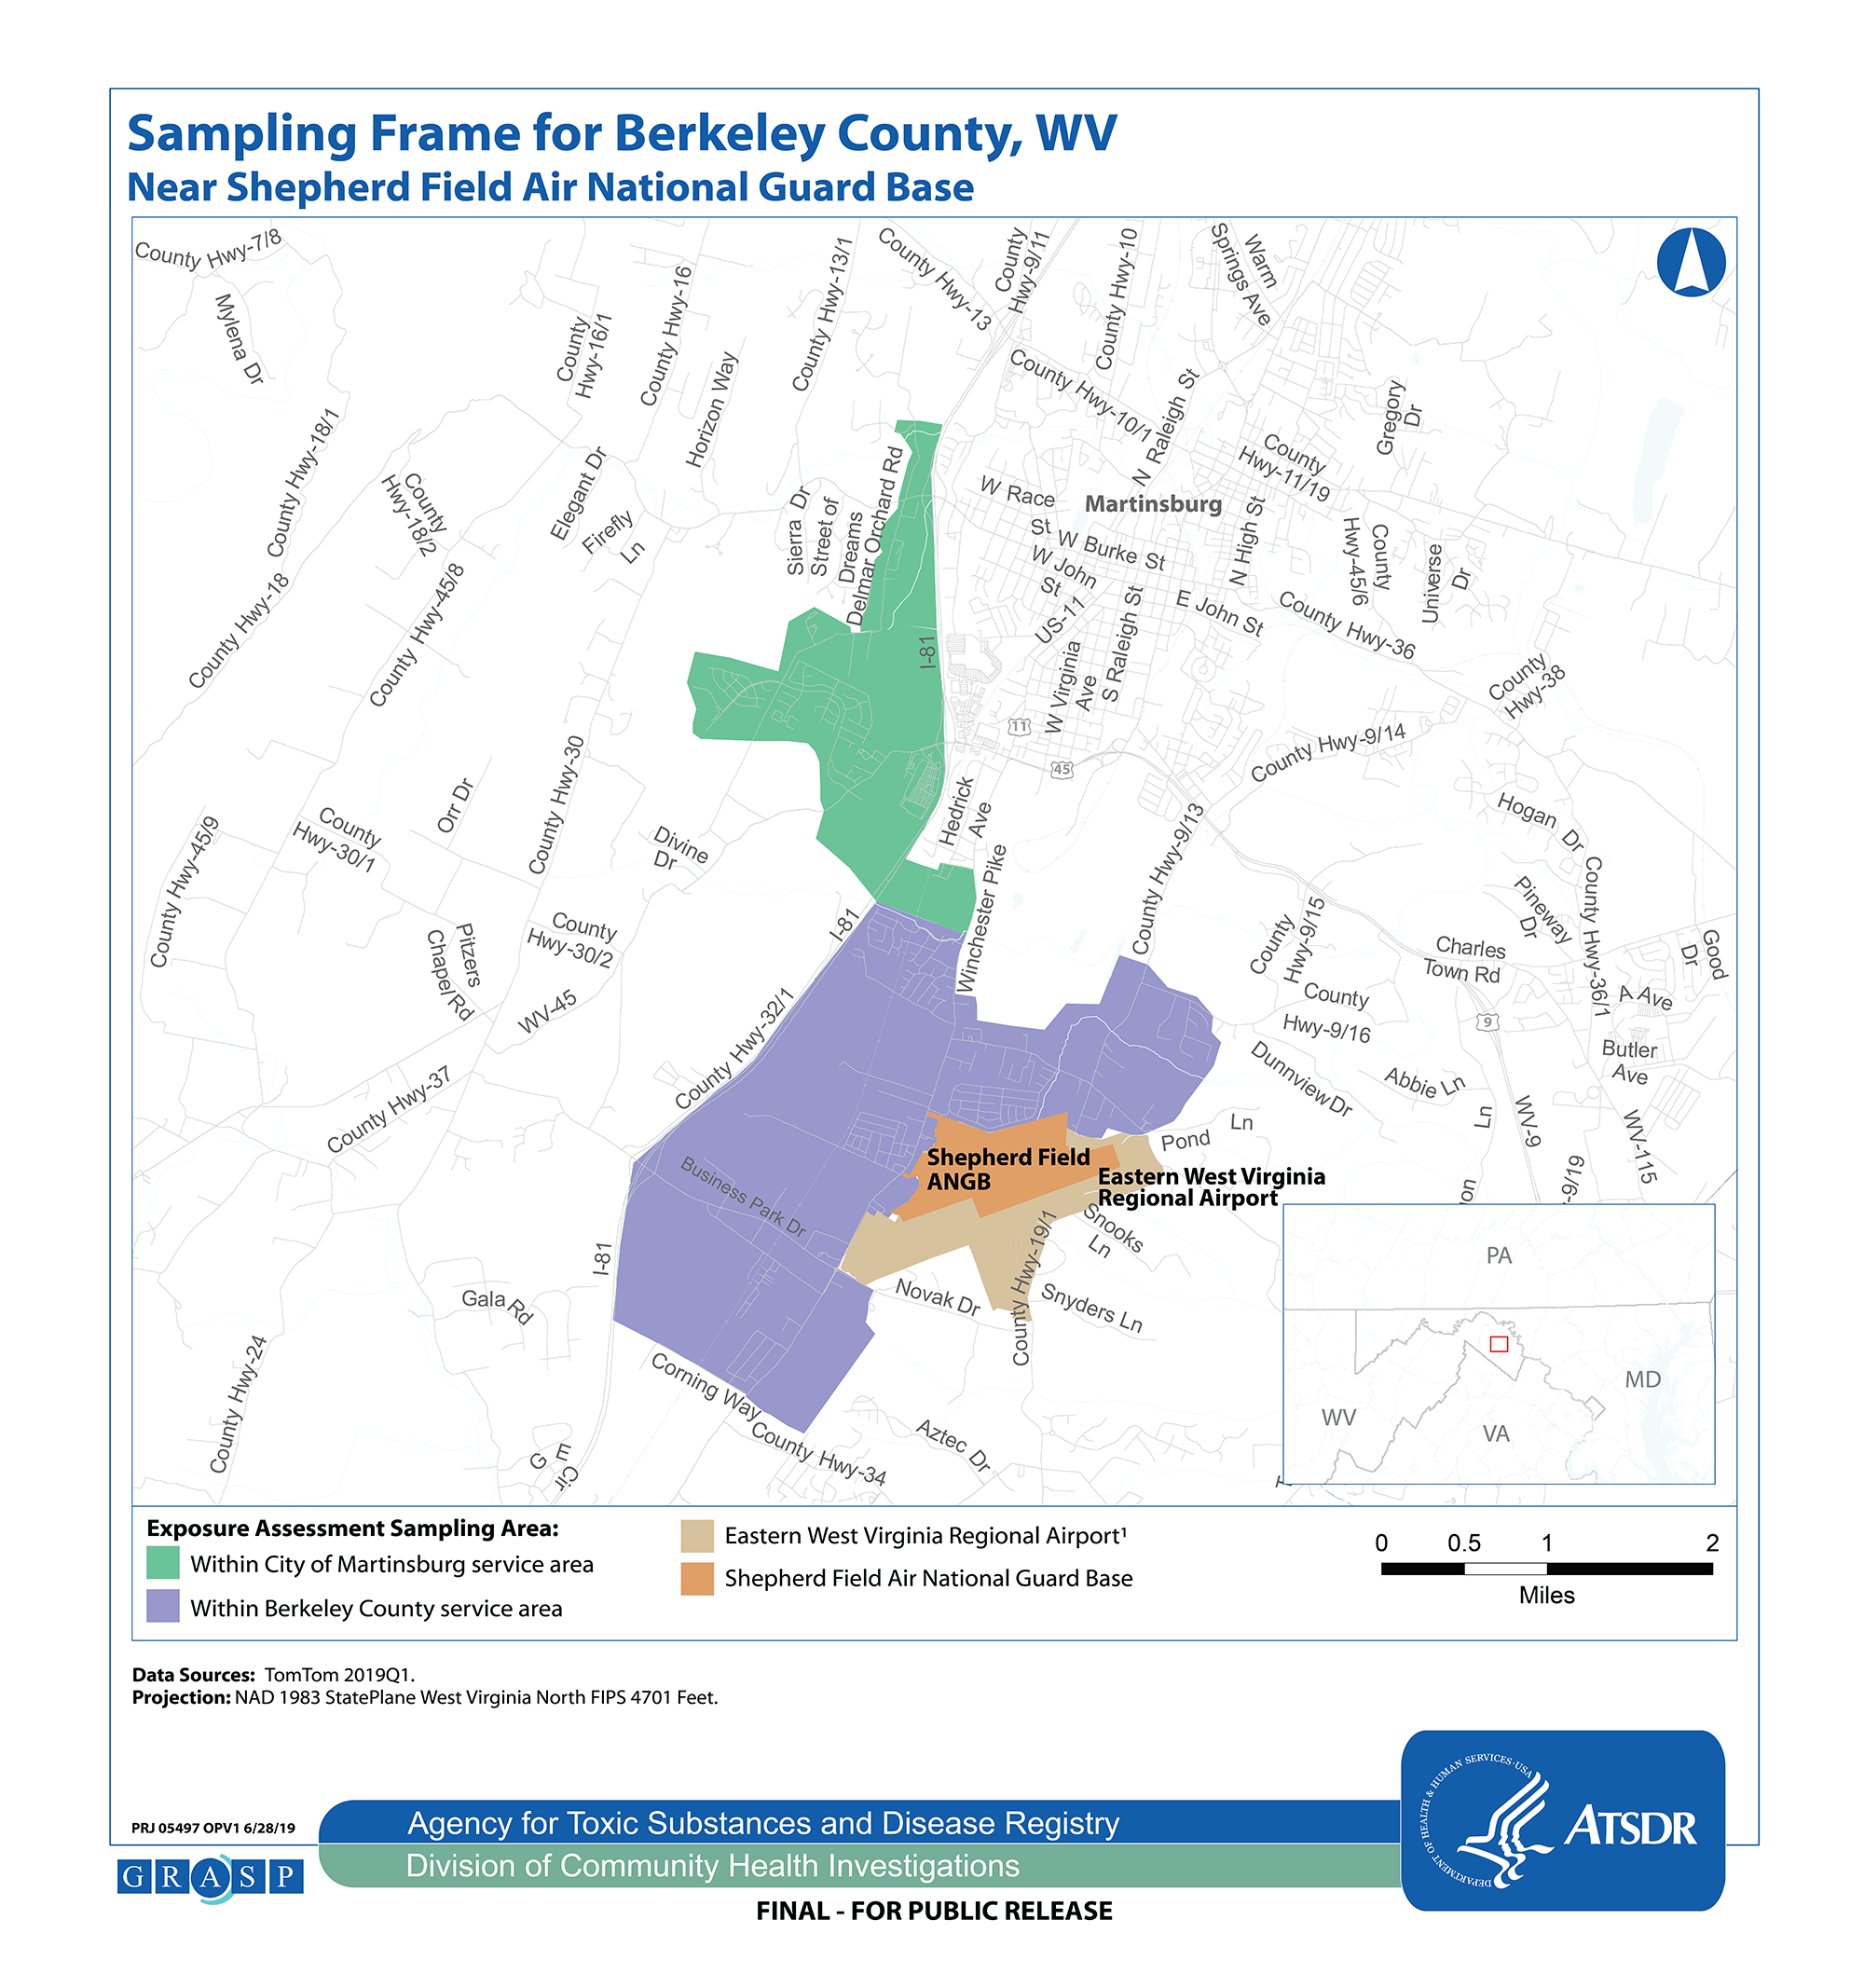 Berkeley County (WV) near Shepherd Field Air National Guard